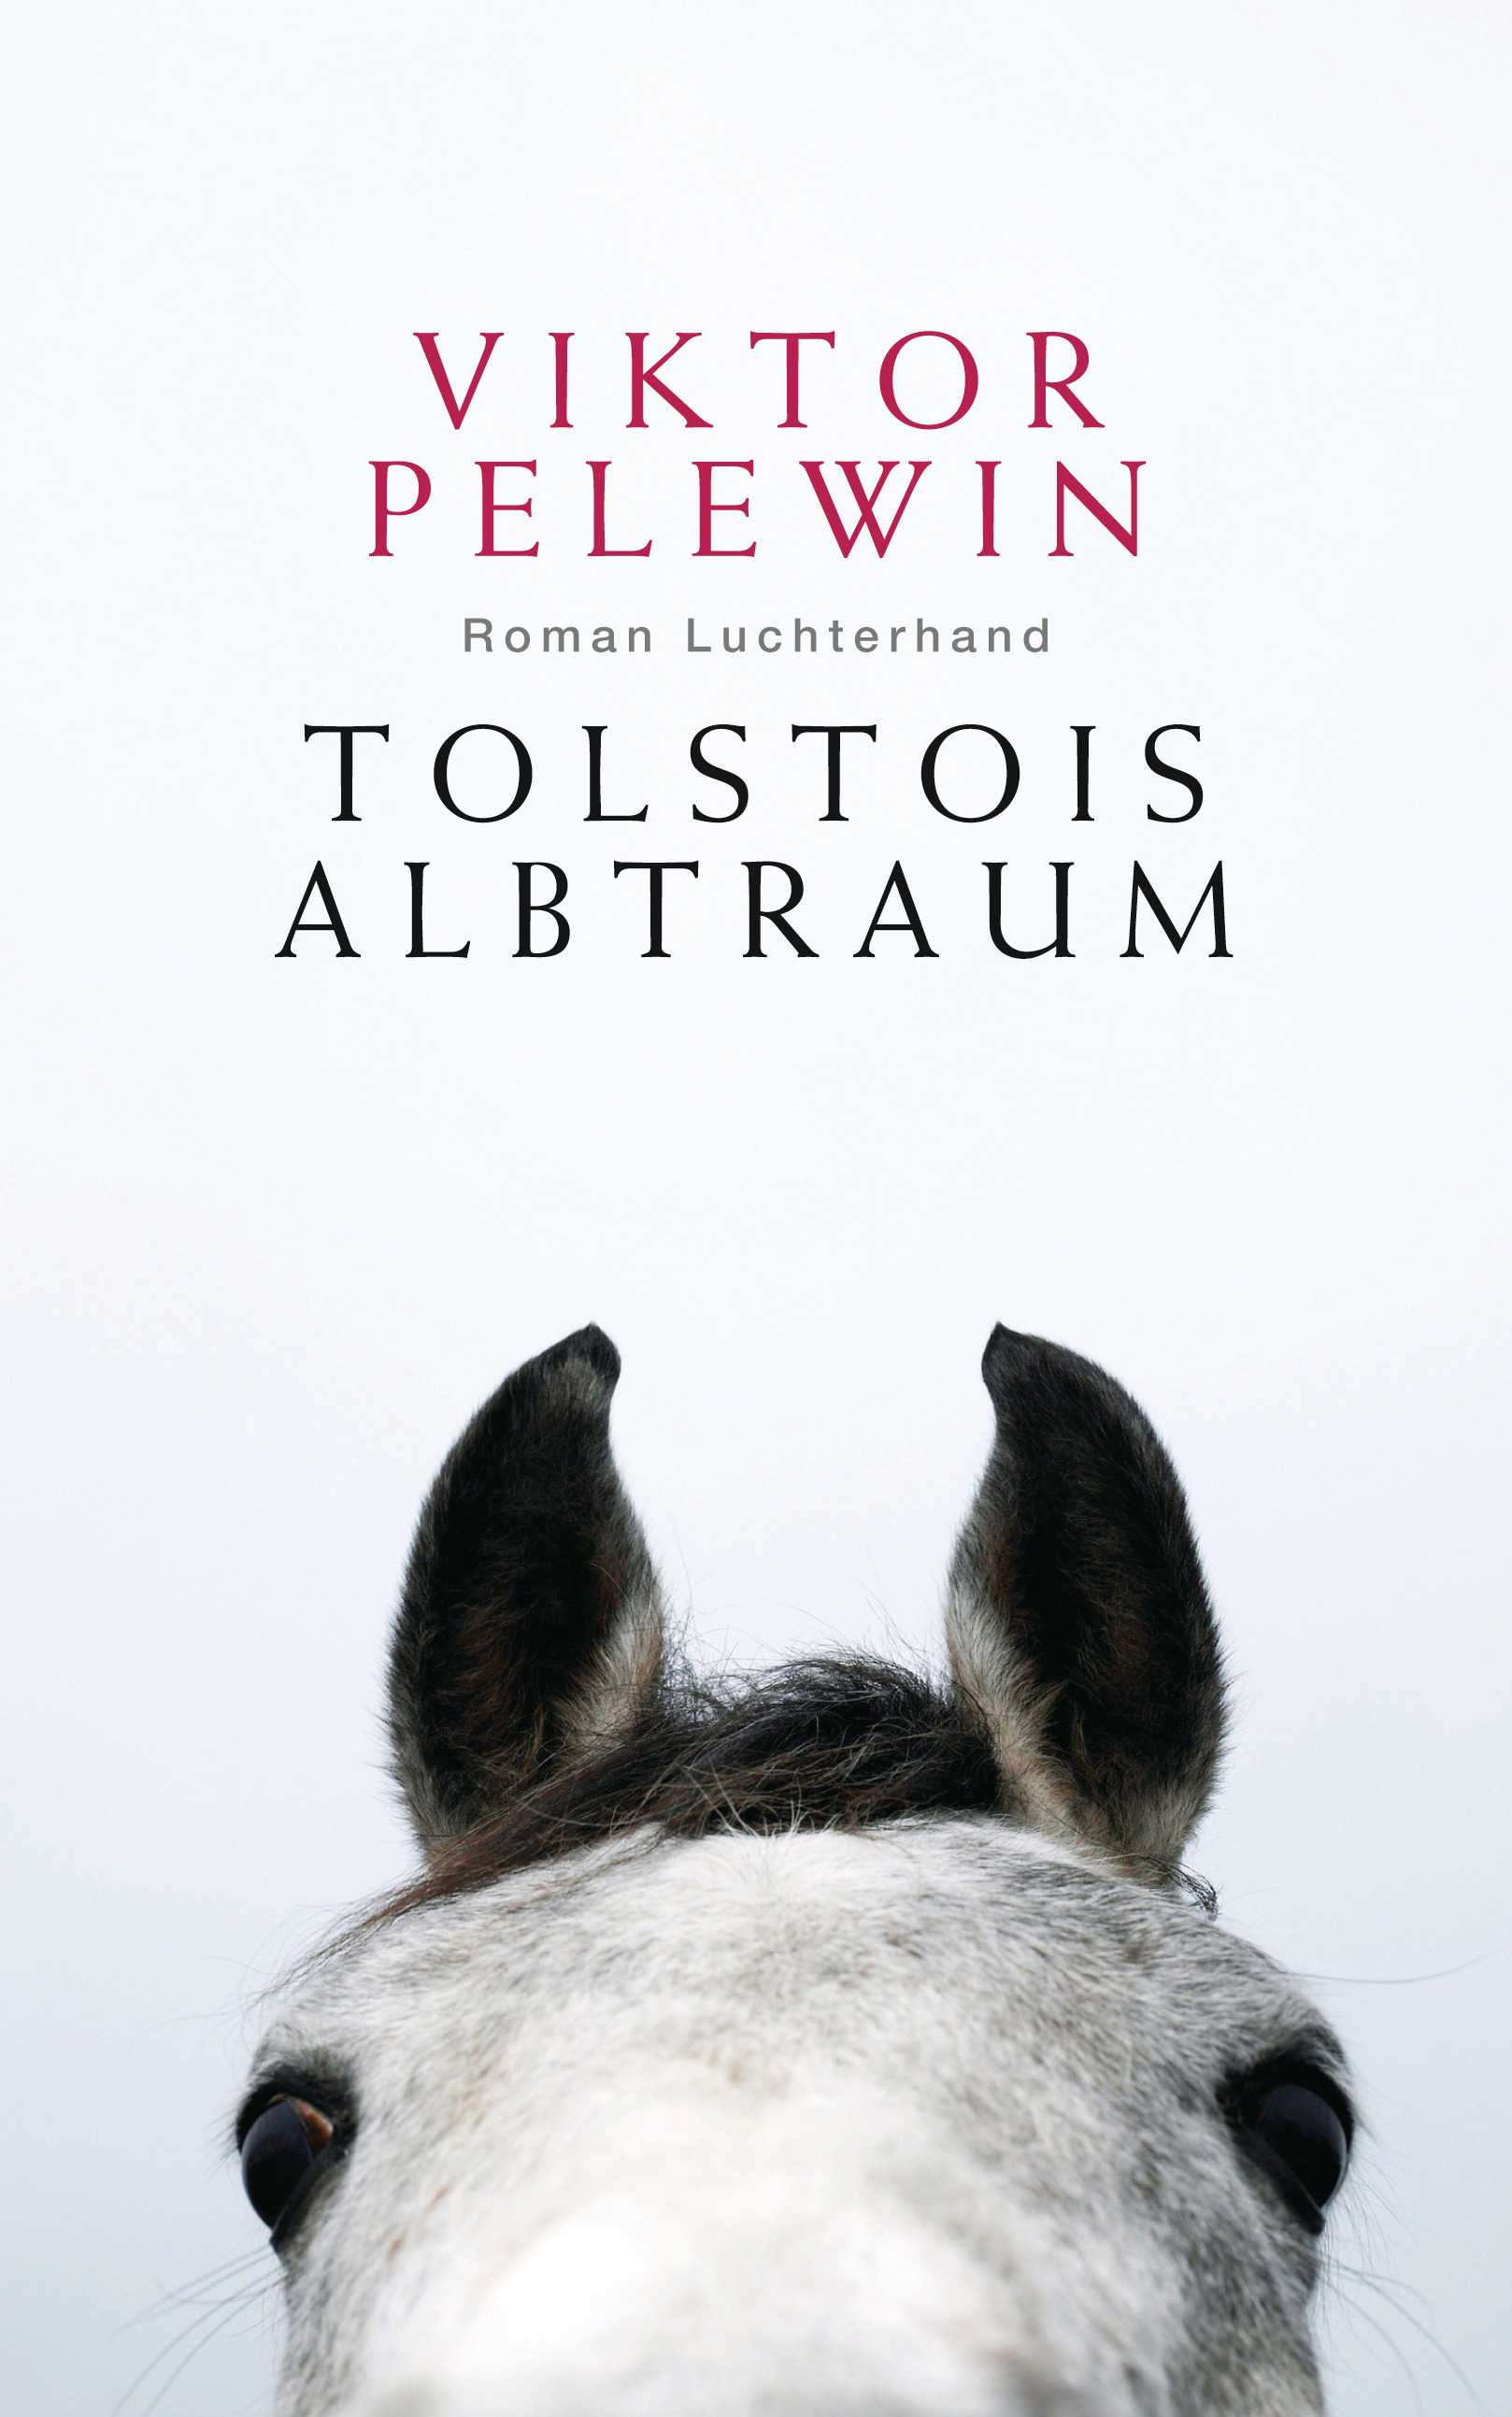 Tolstois Albtraum